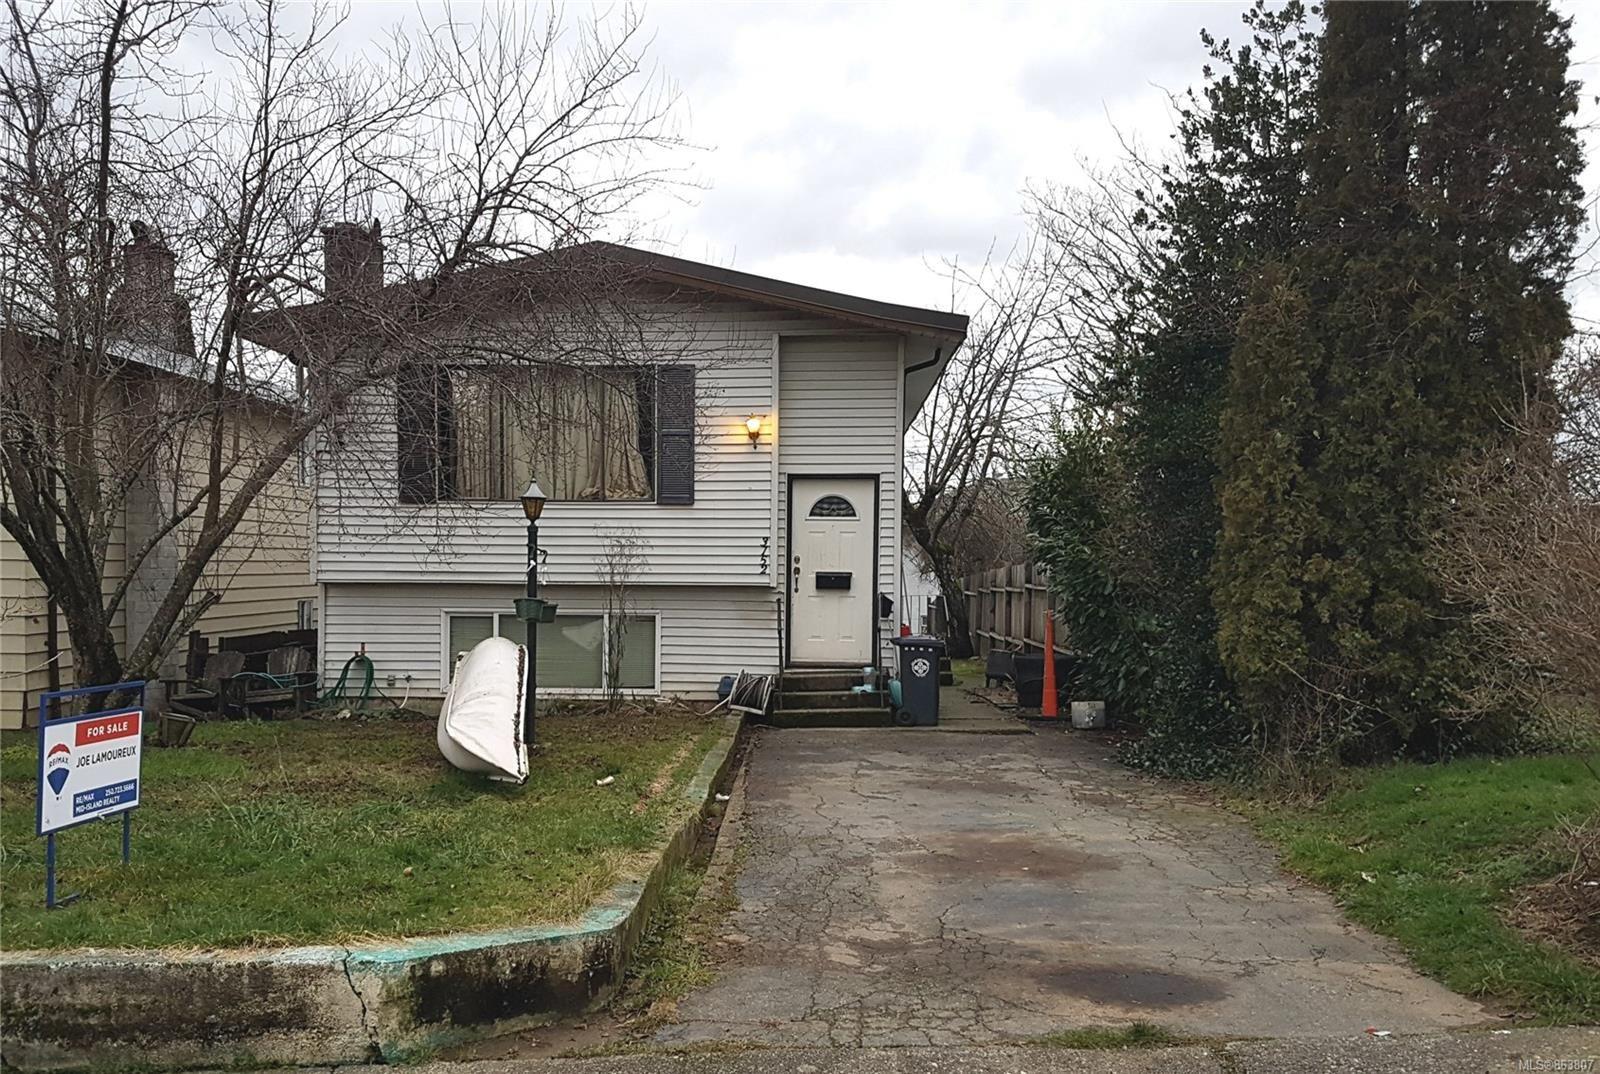 Main Photo: 3752 5th Ave in : PA Port Alberni House for sale (Port Alberni)  : MLS®# 863807